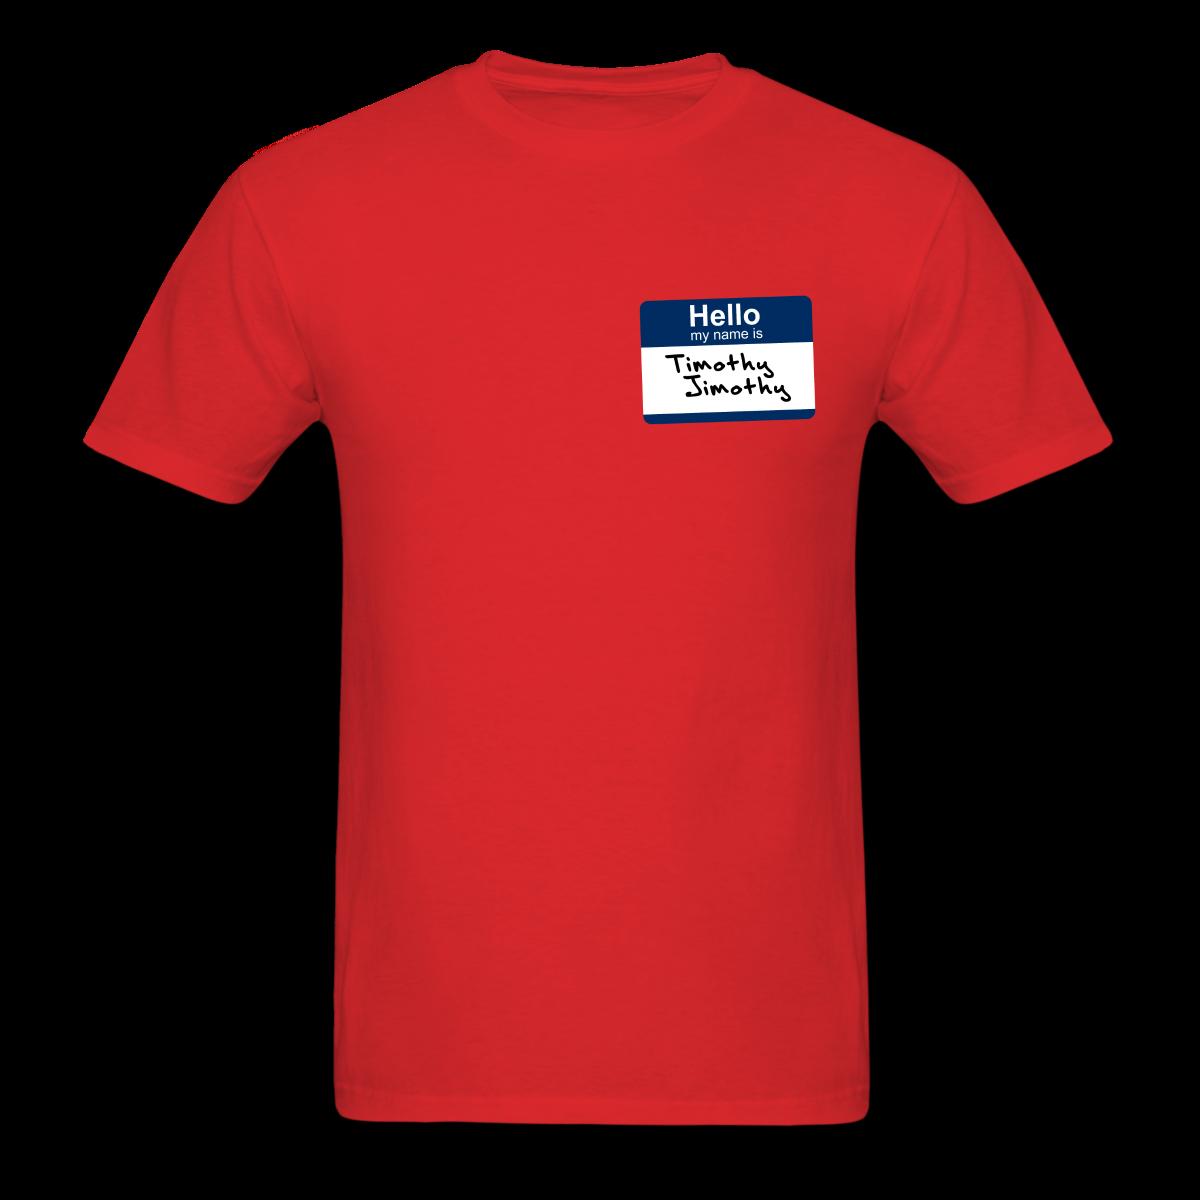 timothy-jimothy-men-s-t-shirt.png